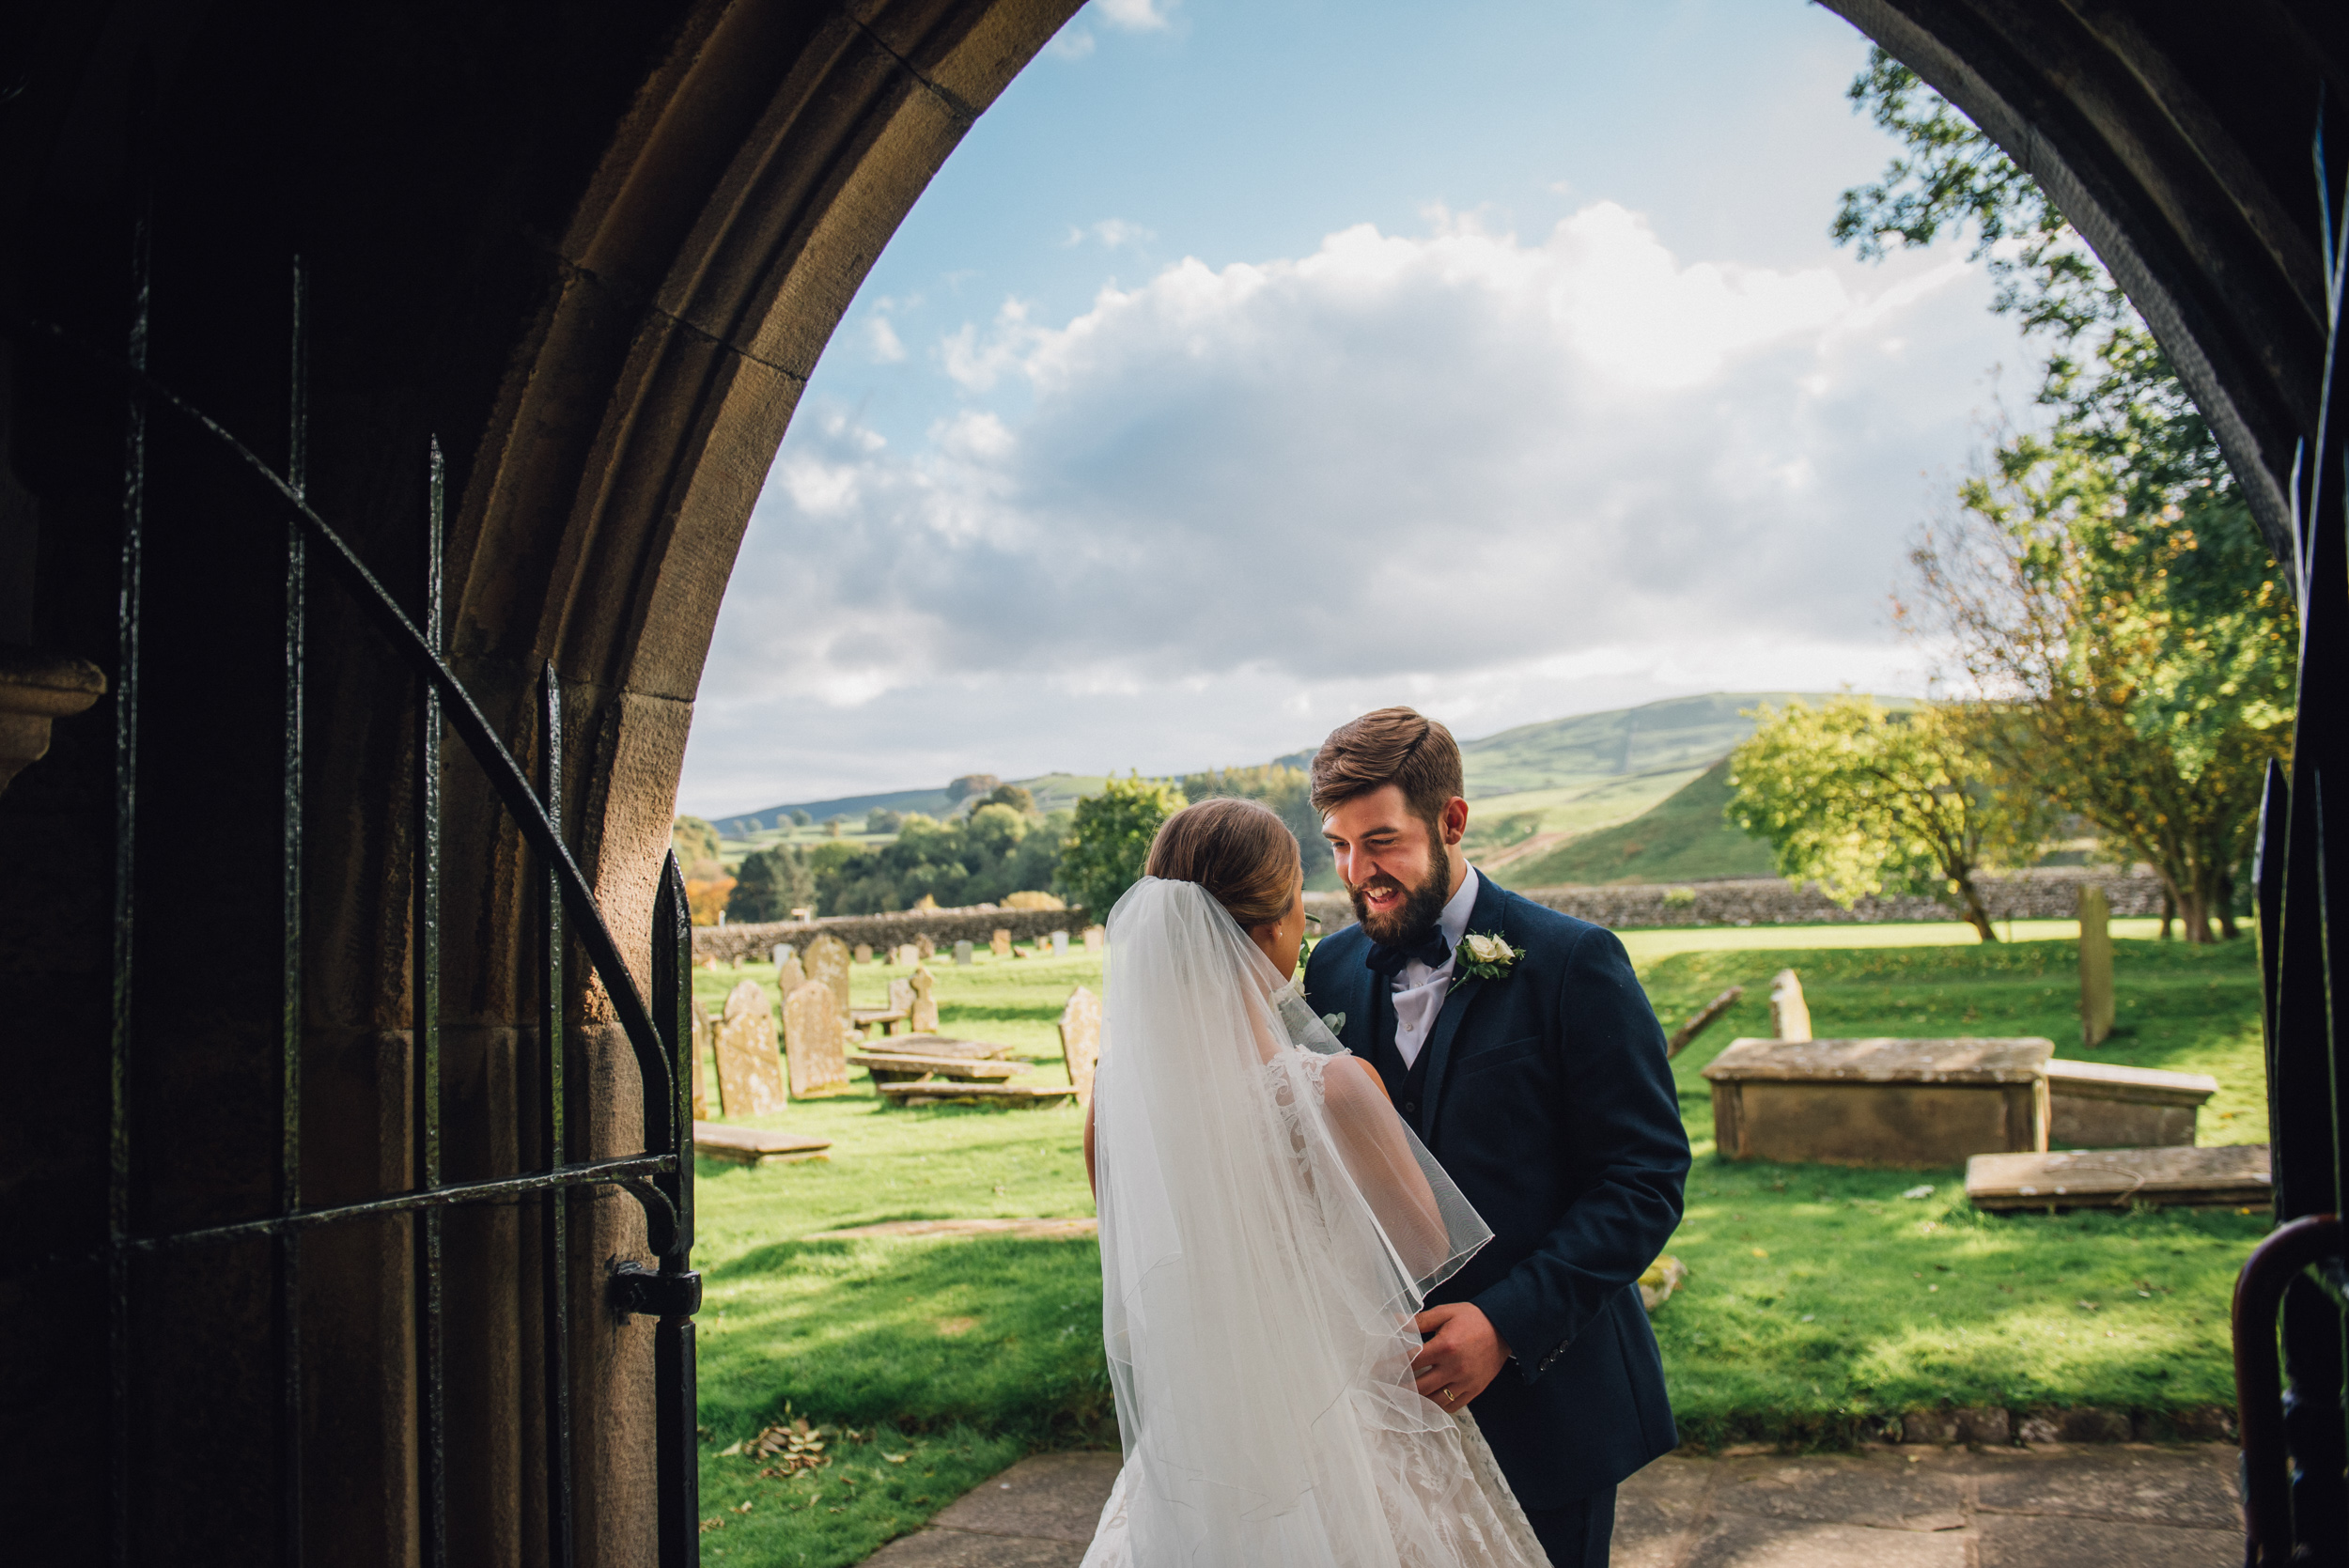 David Scholes Lancashire wedding photography 2016-175.jpg